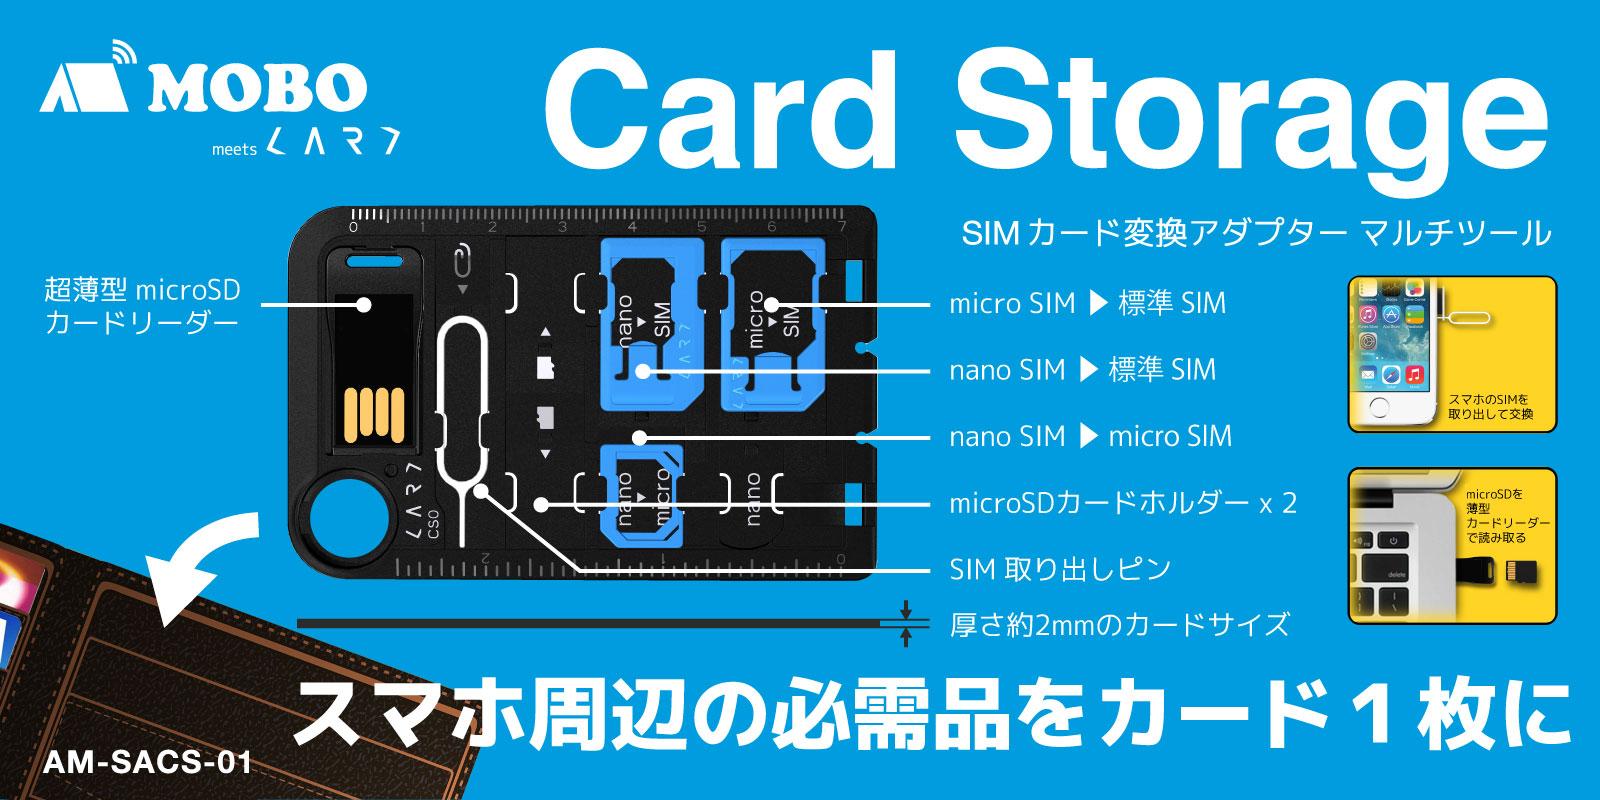 CardStorage